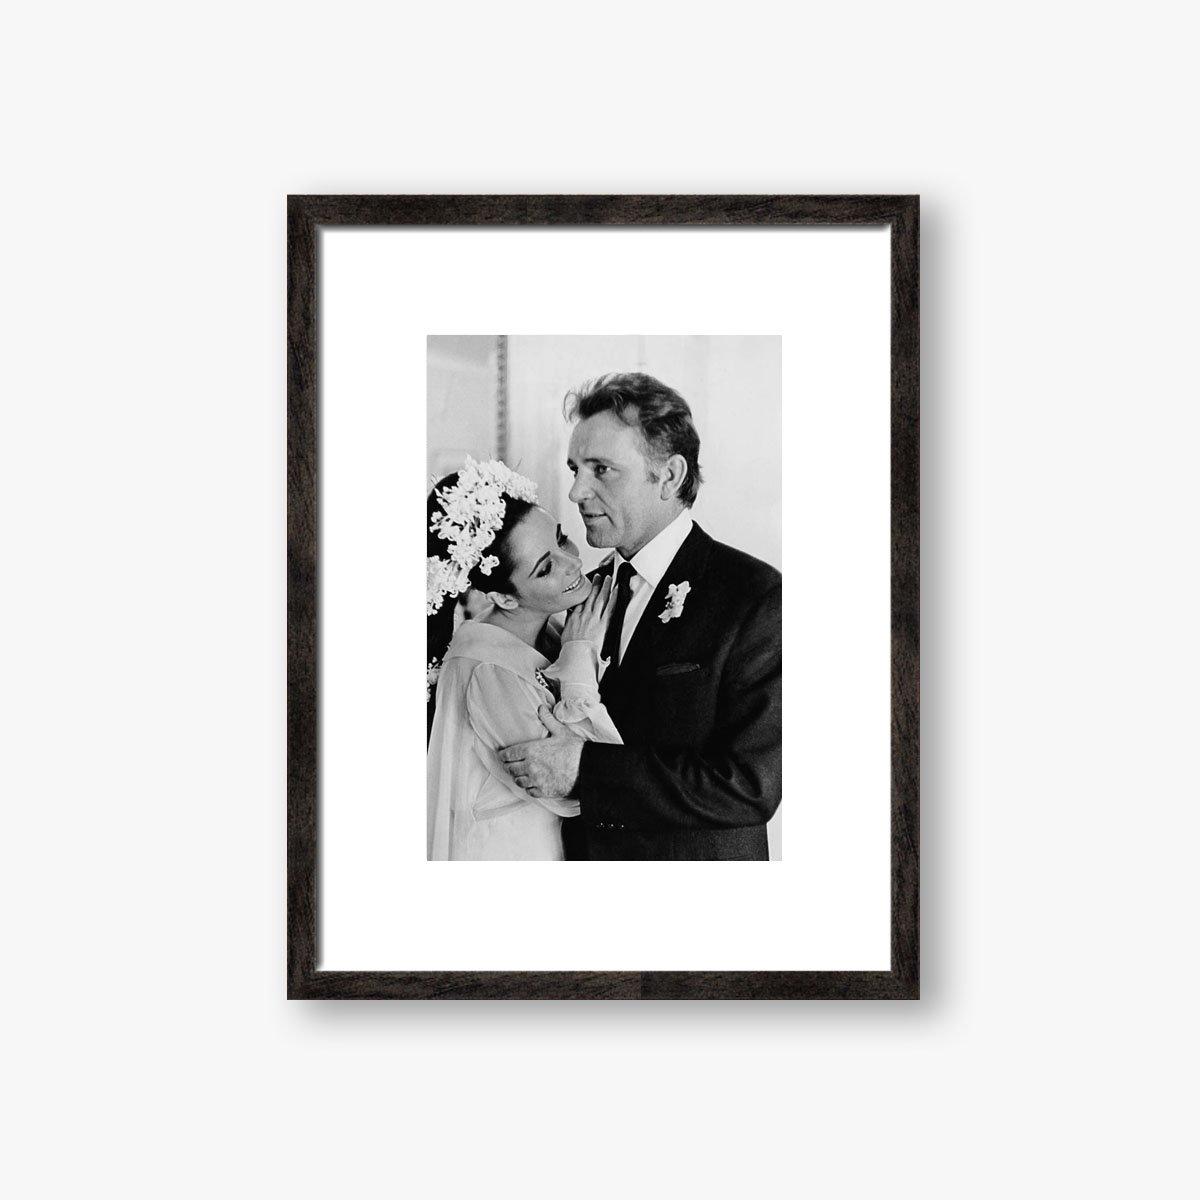 Taylor-Burton Wedding by Bill Lovelace